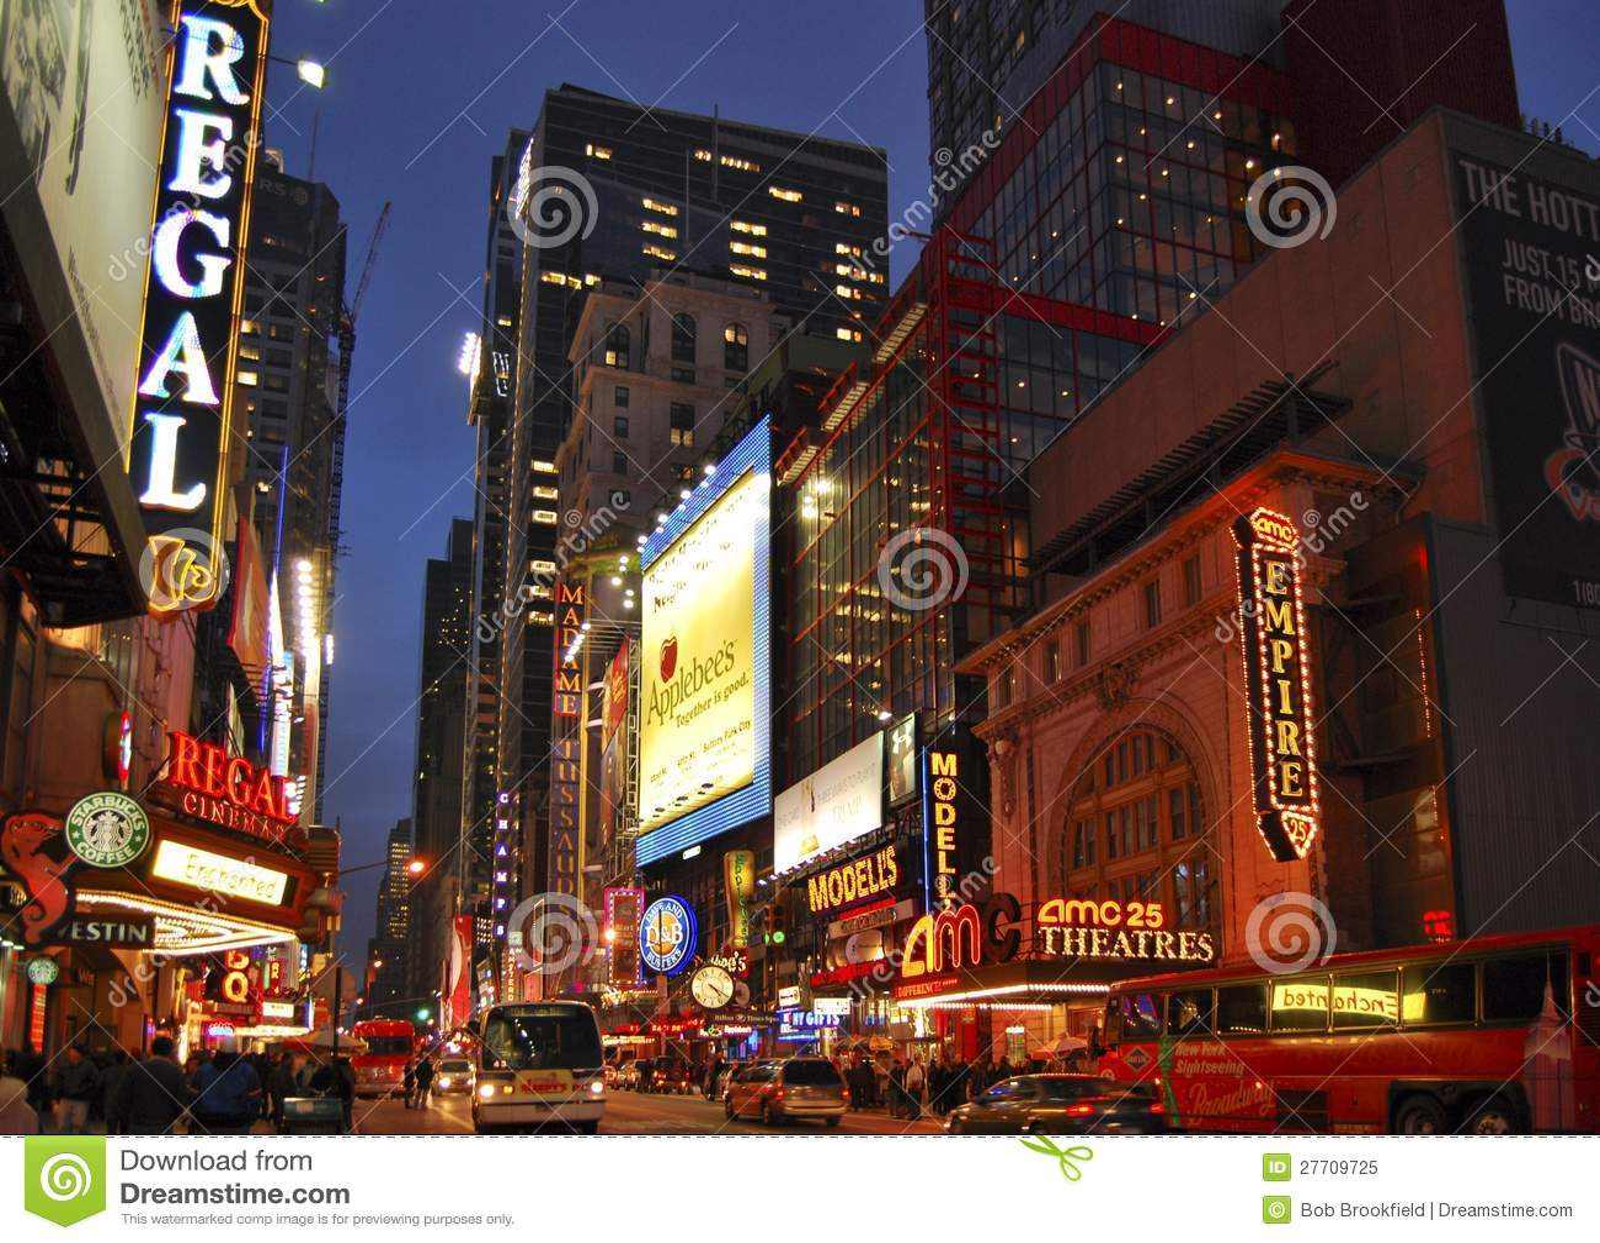 Theater District Manhattan New York City Editorial Photo